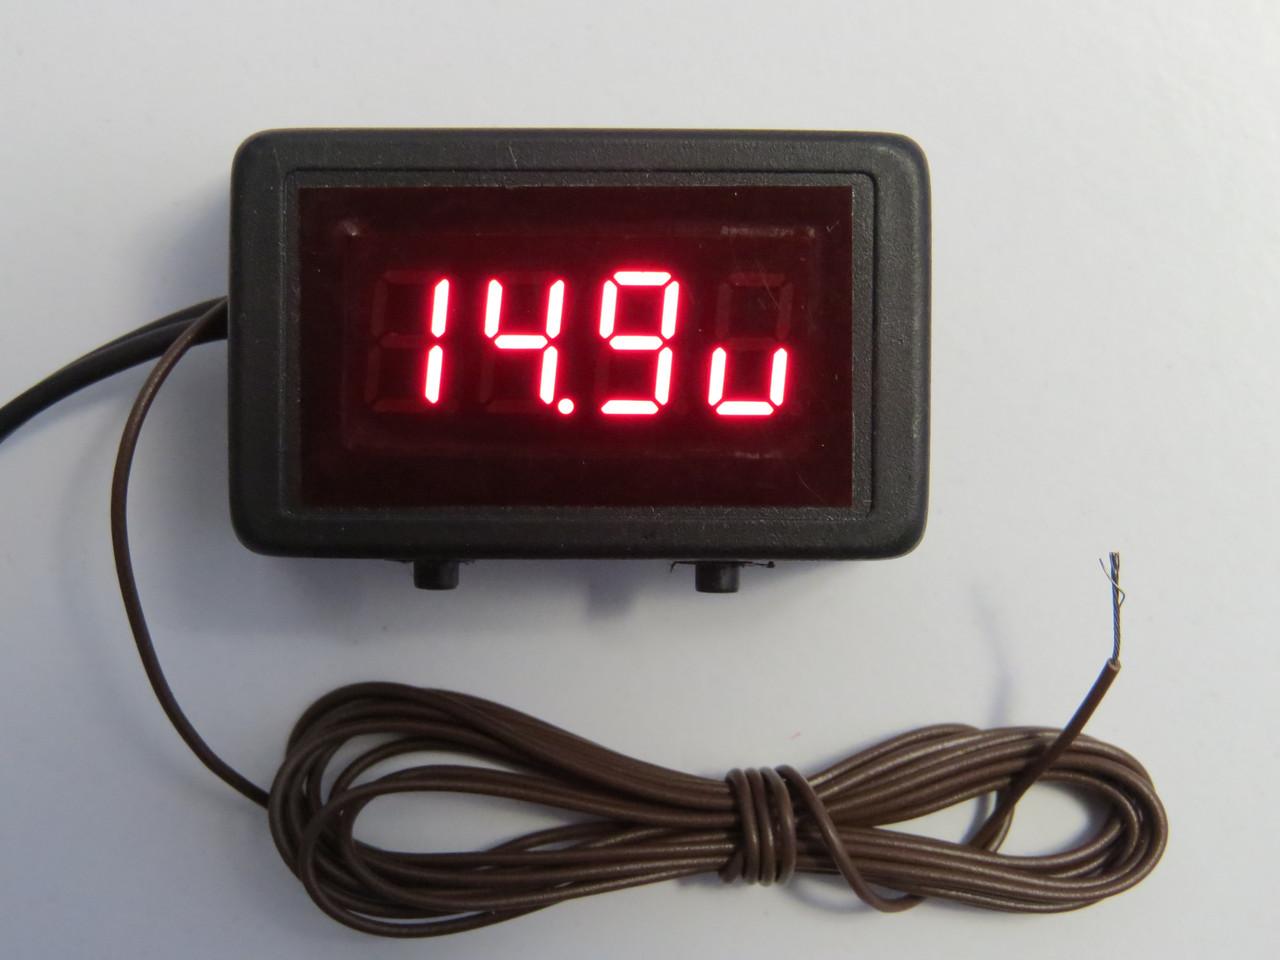 Тахометр вольтметр часы для 4х цилиндровых бензиновых двигателей Форсаж